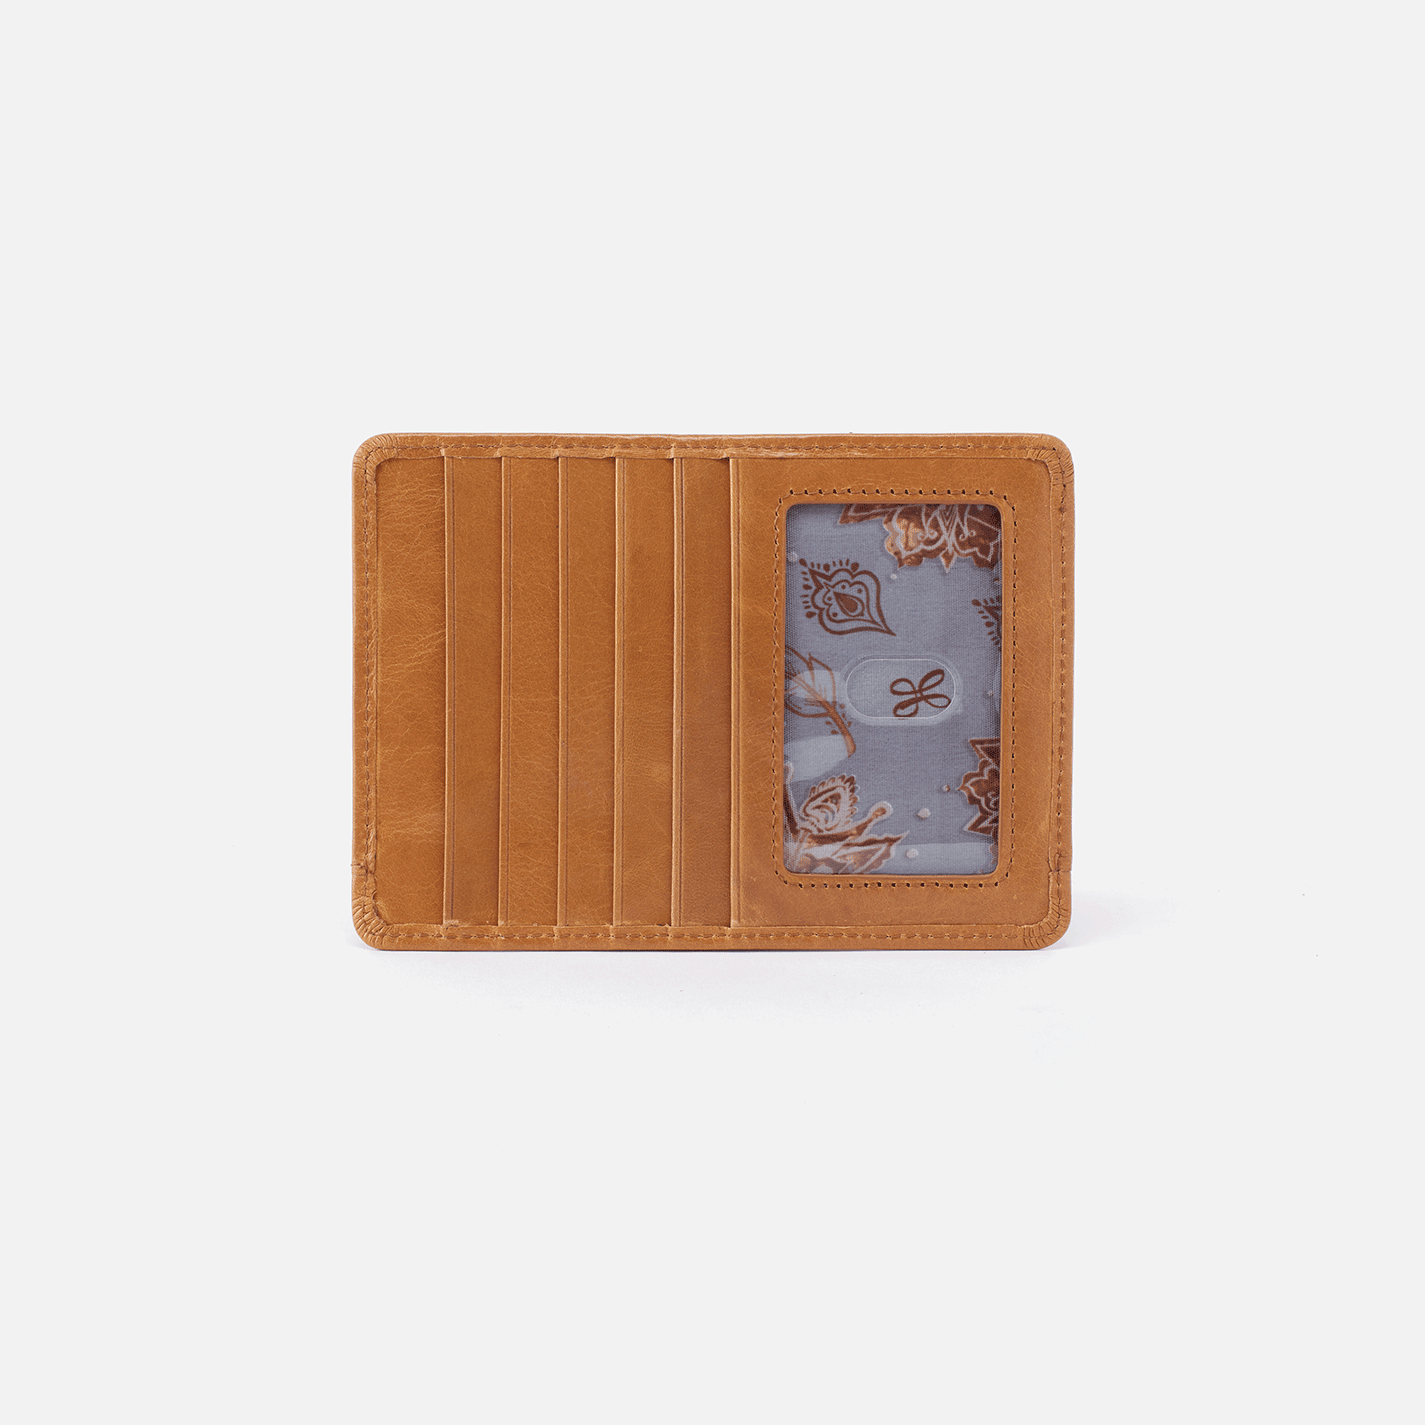 Hobo HOBO Euro Slide Credit Card Wallet